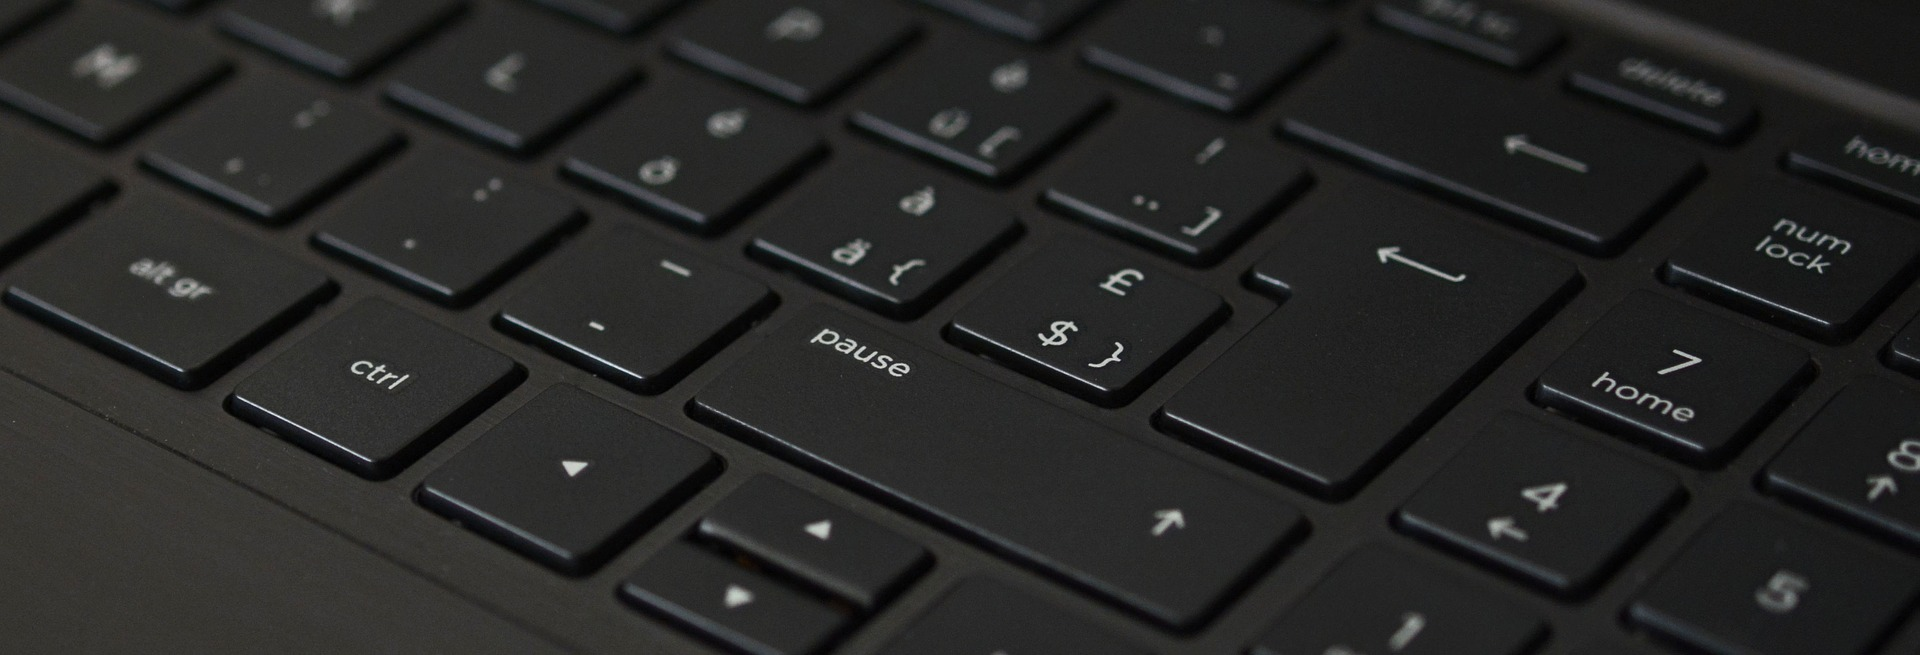 keyboard 1385706 1920